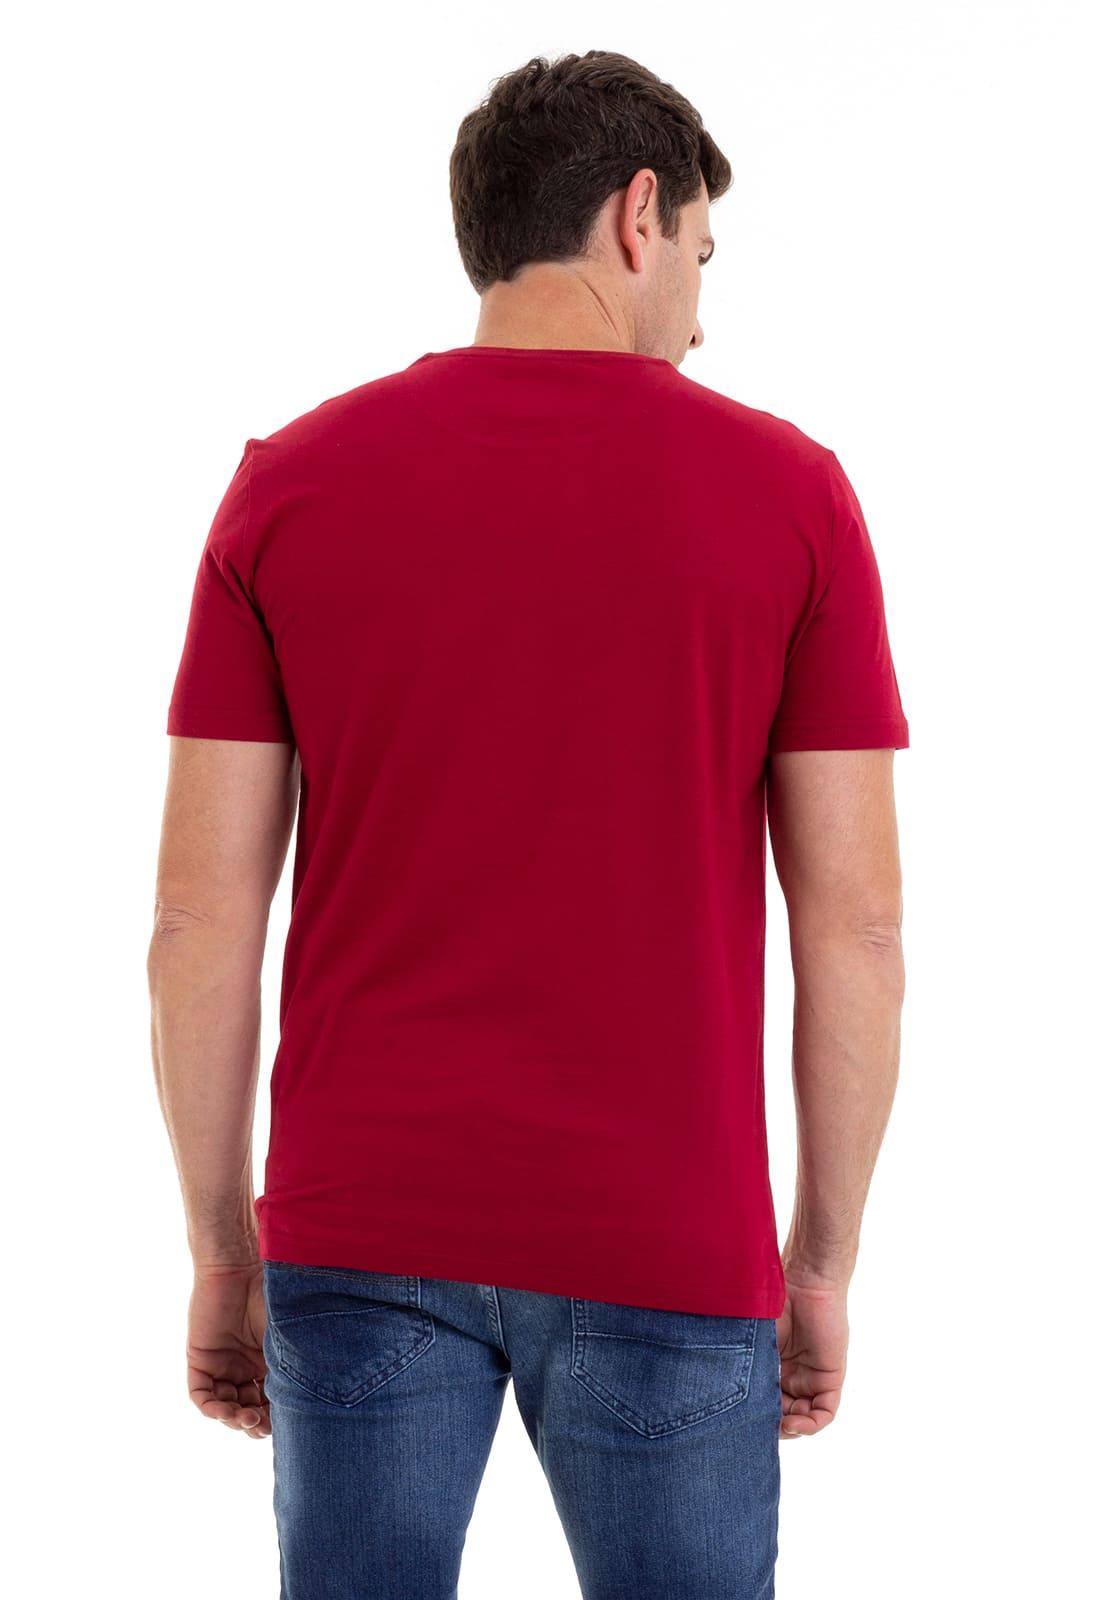 Camiseta Masculina 100% Algodão Super Premium, Na Cor Vinho